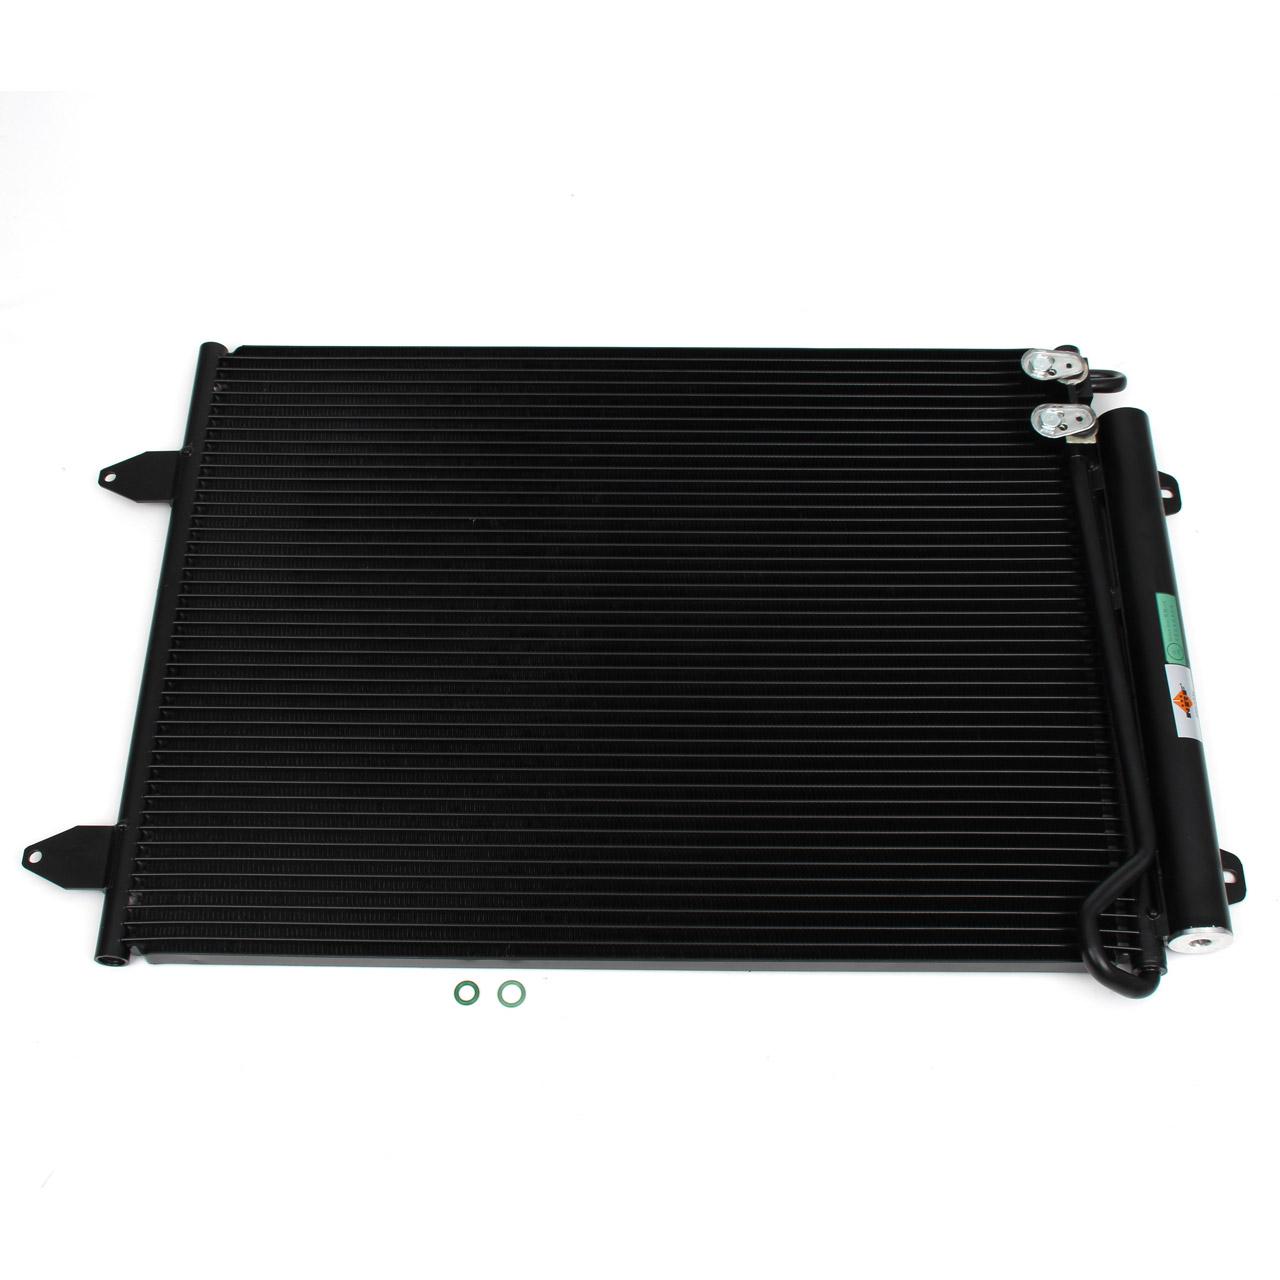 NRF 35614 Kondensator Klimakondensator EASY FIT VW Passat 3C CC 1.0-2.0 2.0 TDI 3C0820411